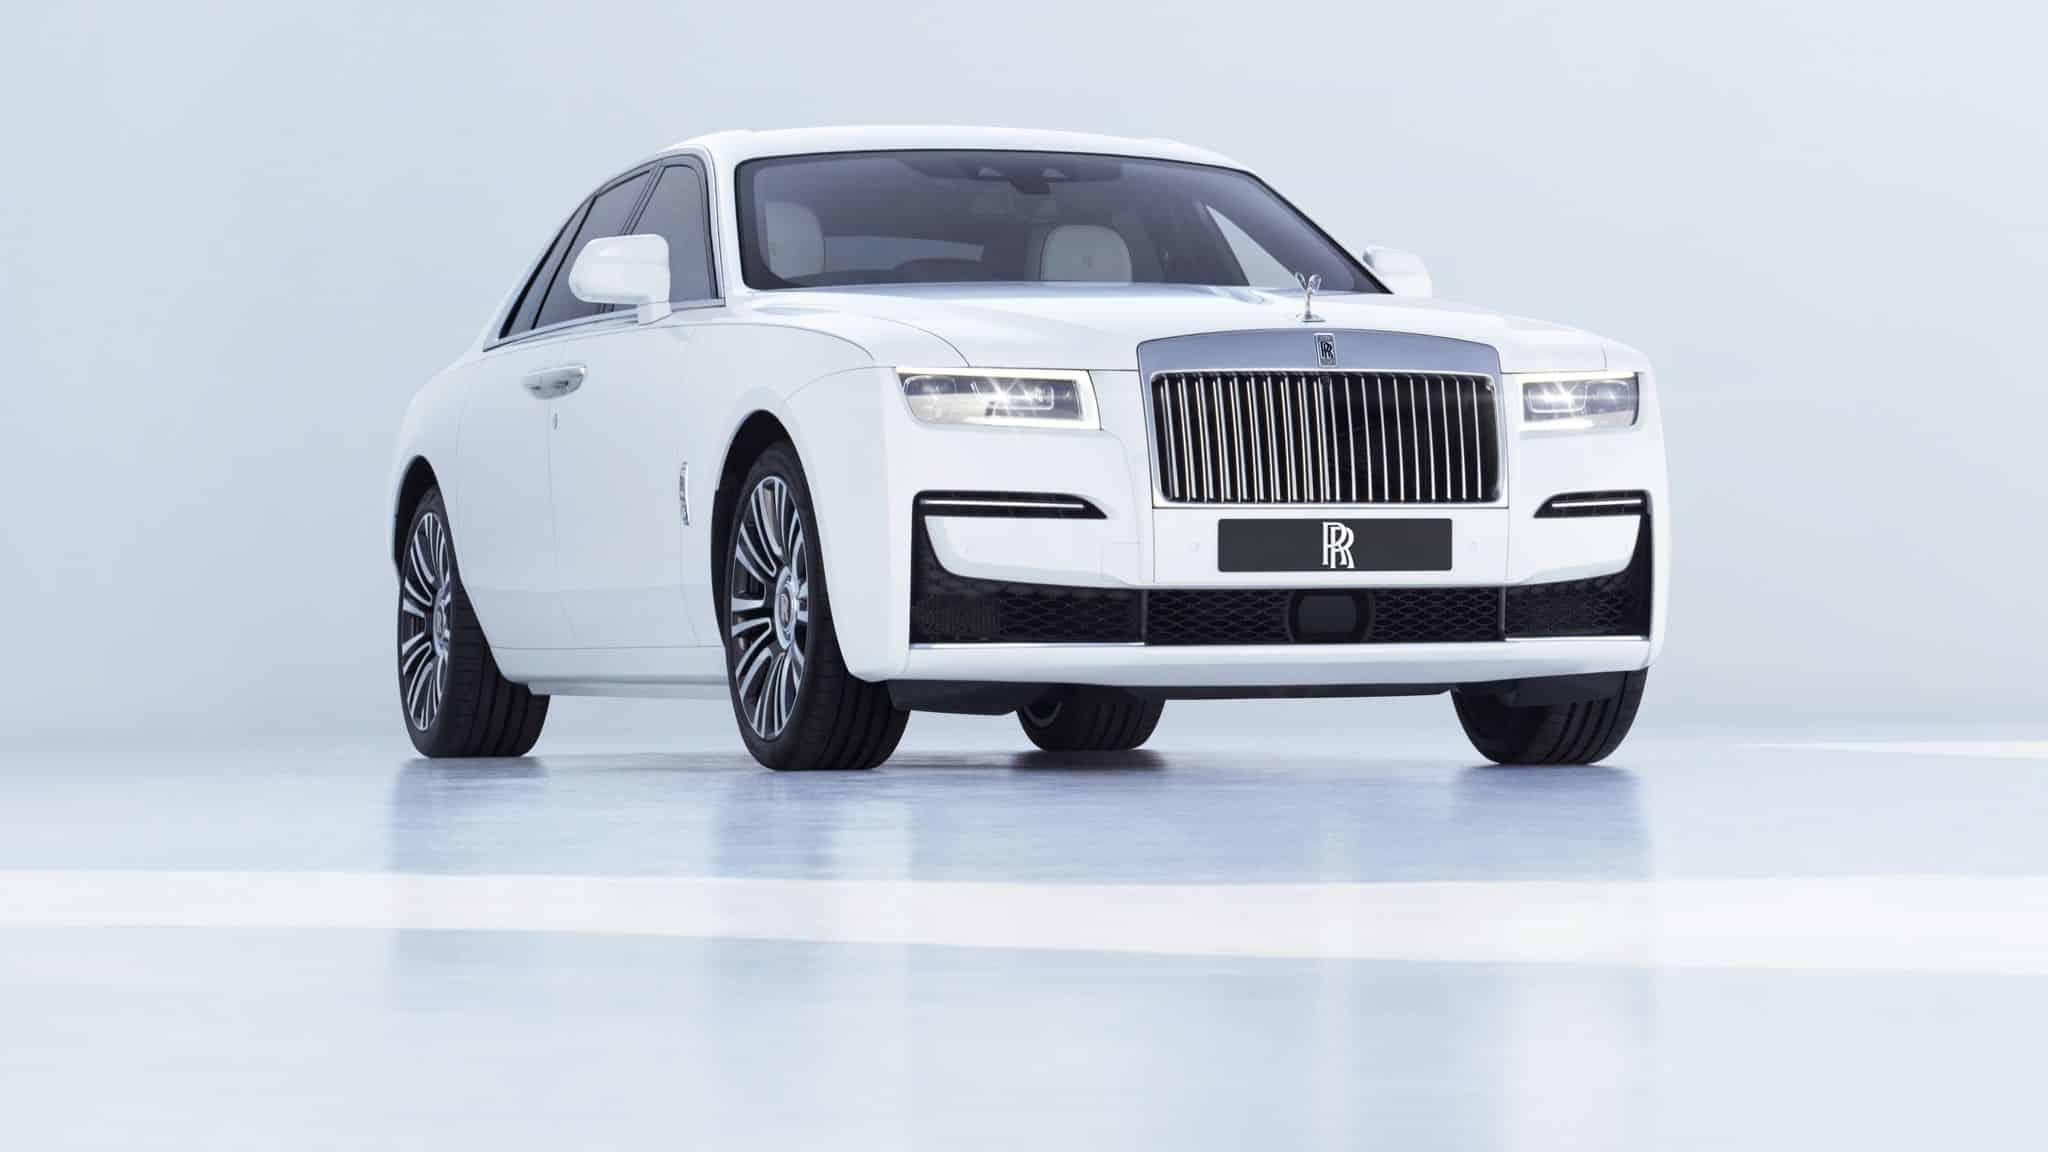 All New Rolls Royce Ghost